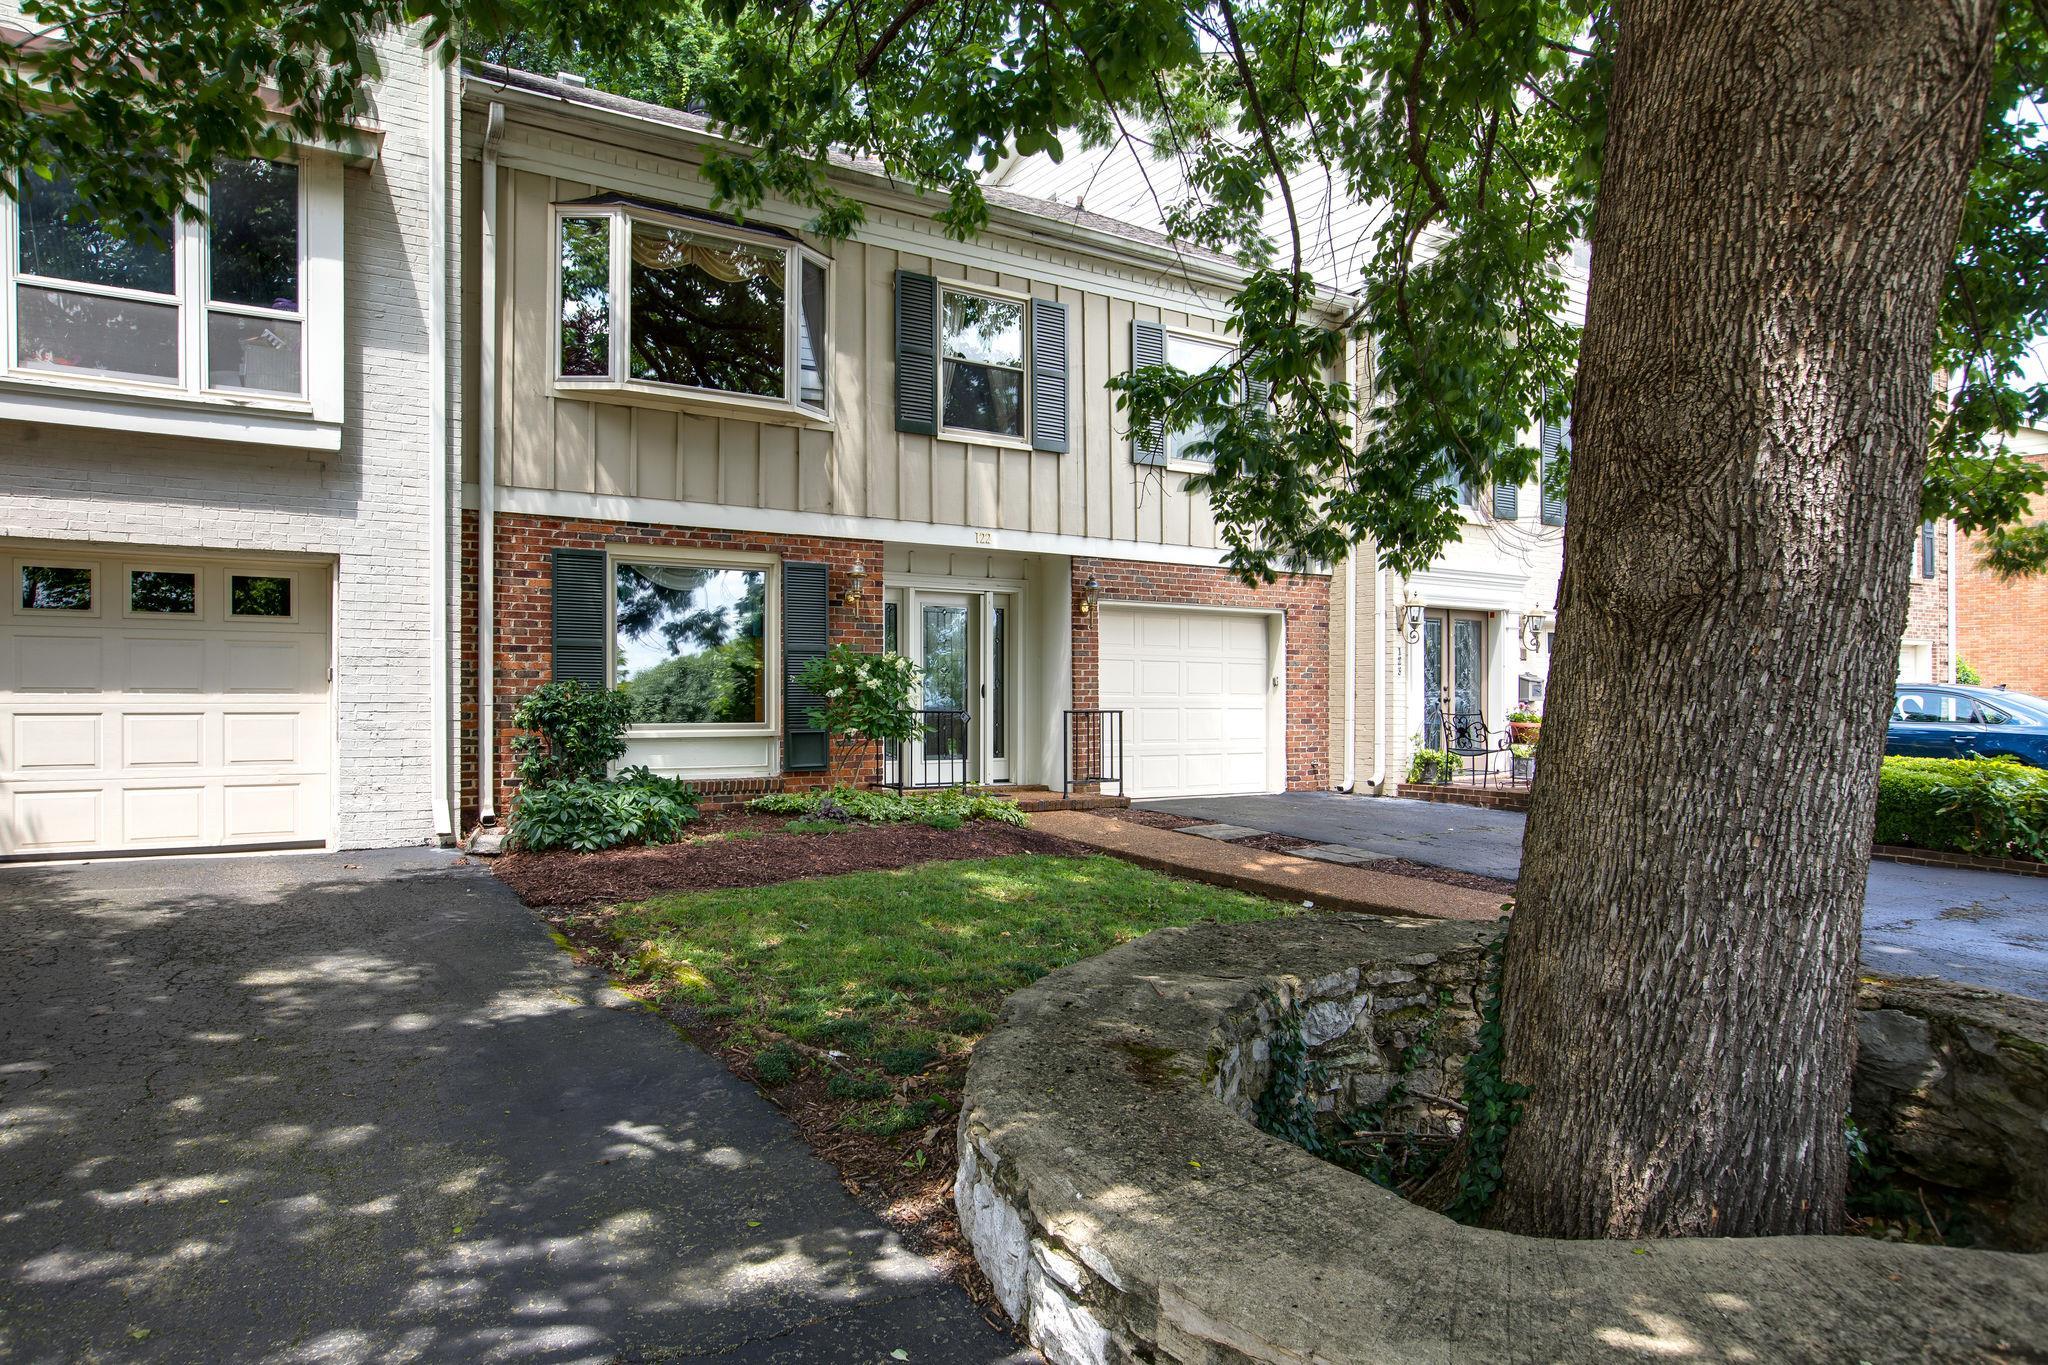 122 Jefferson Sq, Nashville, TN 37215 - Nashville, TN real estate listing